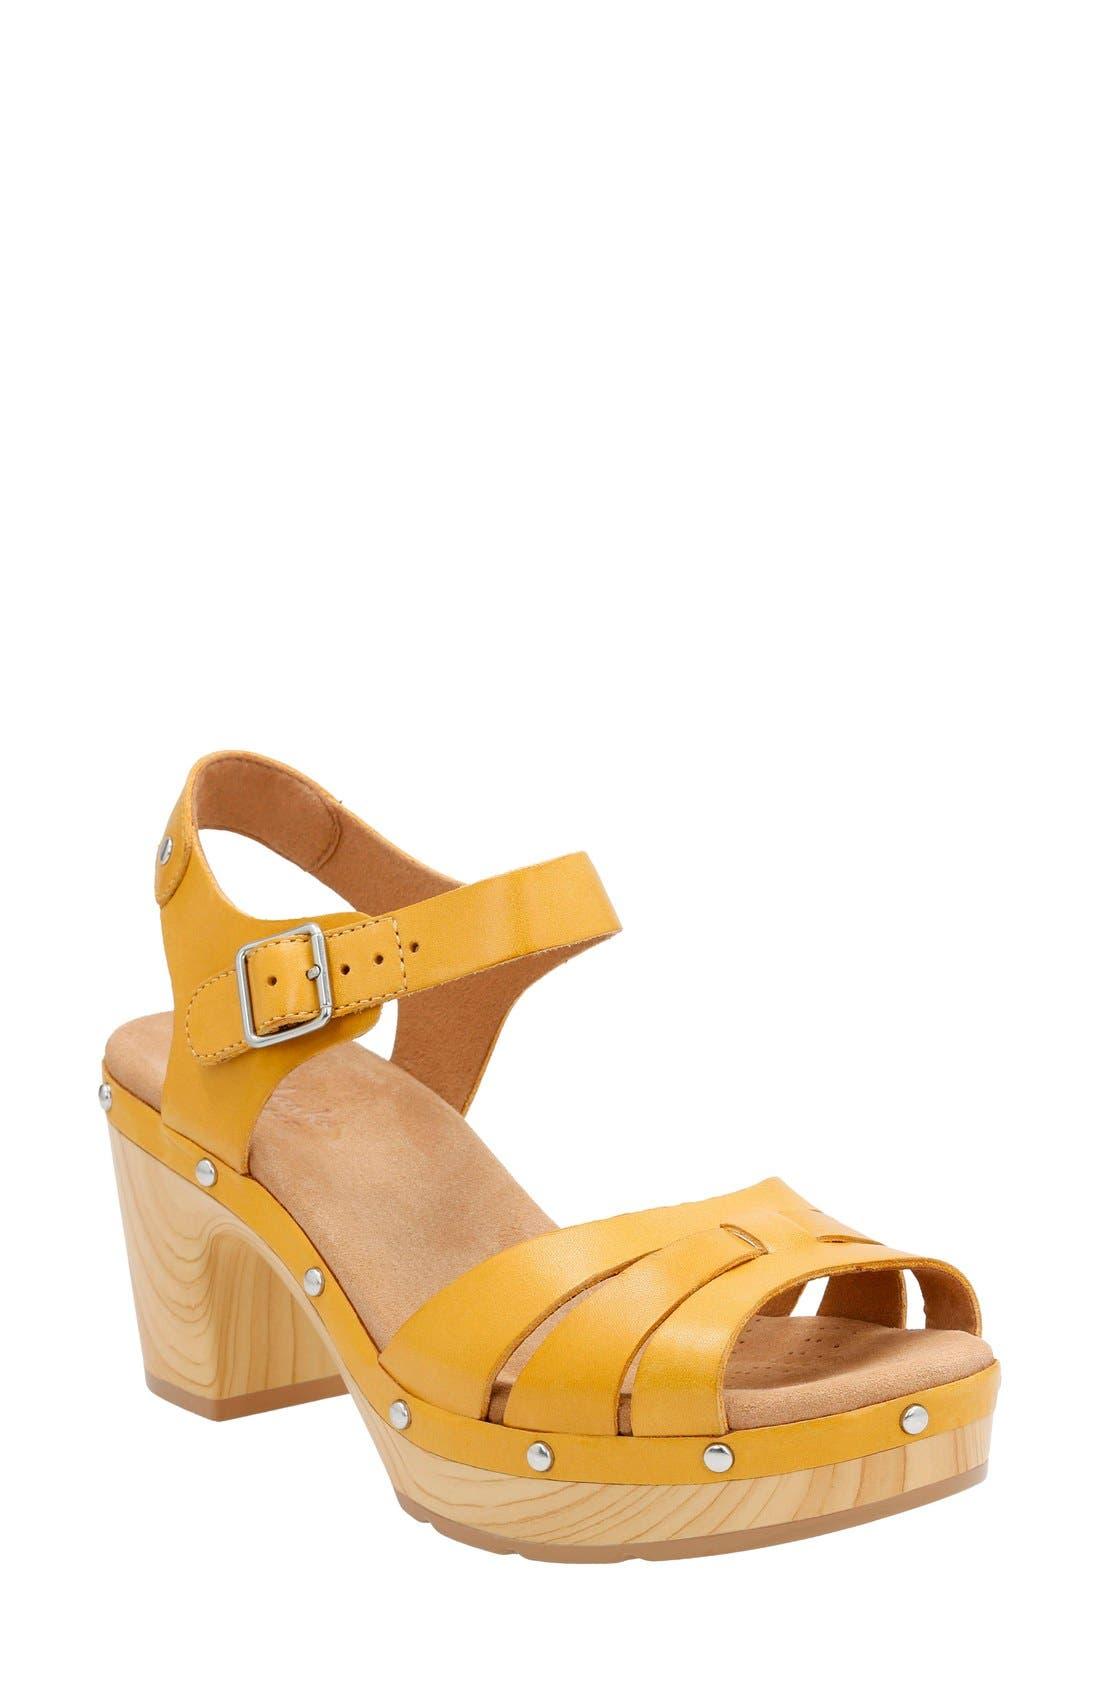 CLARKS® 'Ledella Trail' Sandal